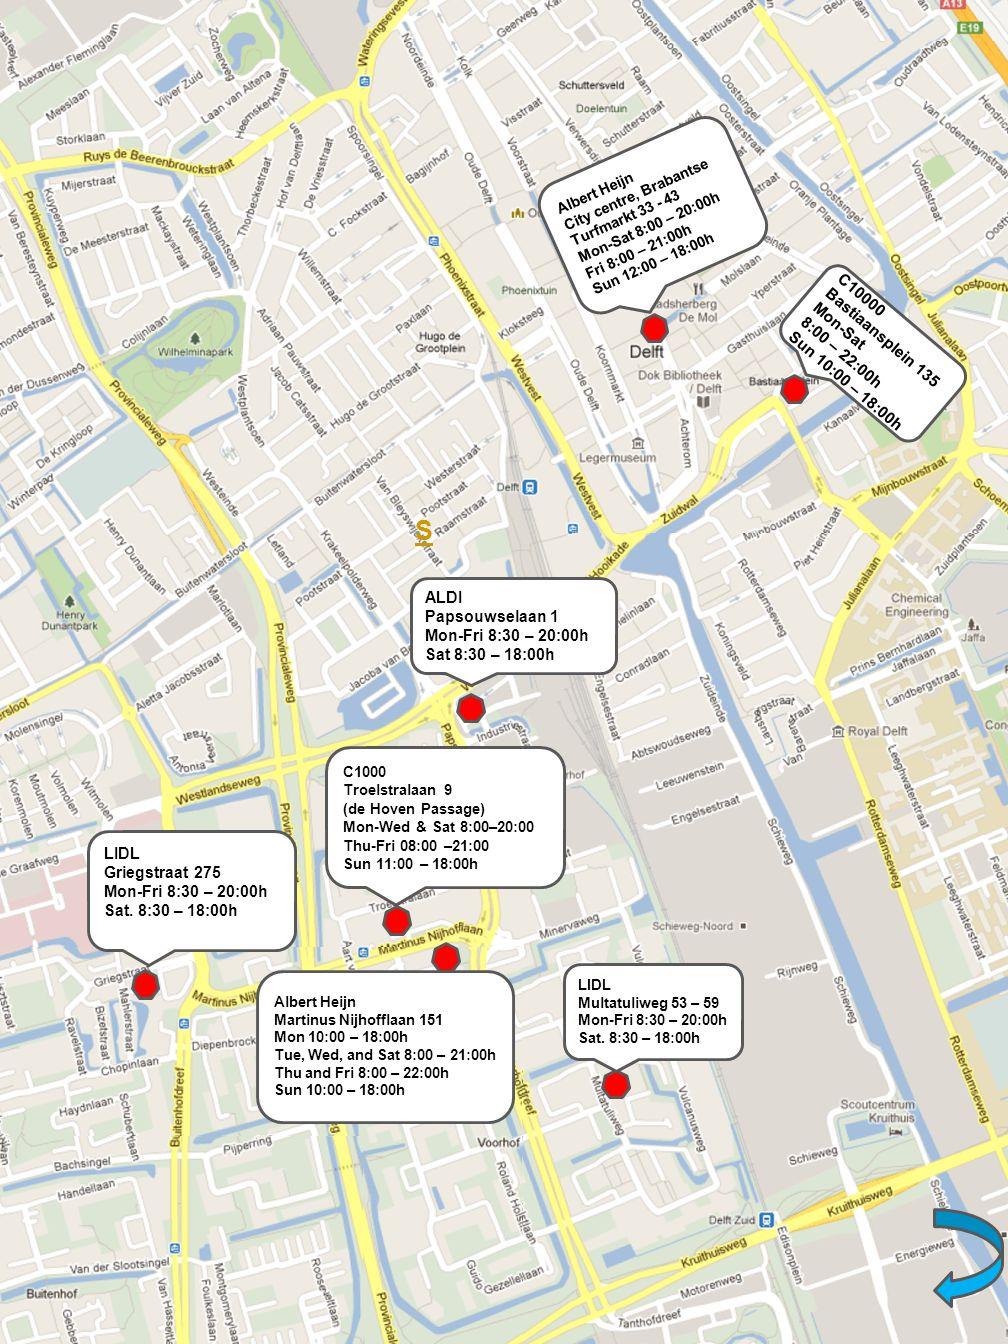 S C10000 Bastiaansplein 135 Mon-Sat 8:00 – 22:00h Sun 10:00 – 18:00h Albert Heijn City centre, Brabantse Turfmarkt 33 - 43 Mon-Sat 8:00 – 20:00h Fri 8:00 – 21:00h Sun 12:00 – 18:00h ALDI Papsouwselaan 1 Mon-Fri 8:30 – 20:00h Sat 8:30 – 18:00h LIDL Multatuliweg 53 – 59 Mon-Fri 8:30 – 20:00h Sat.